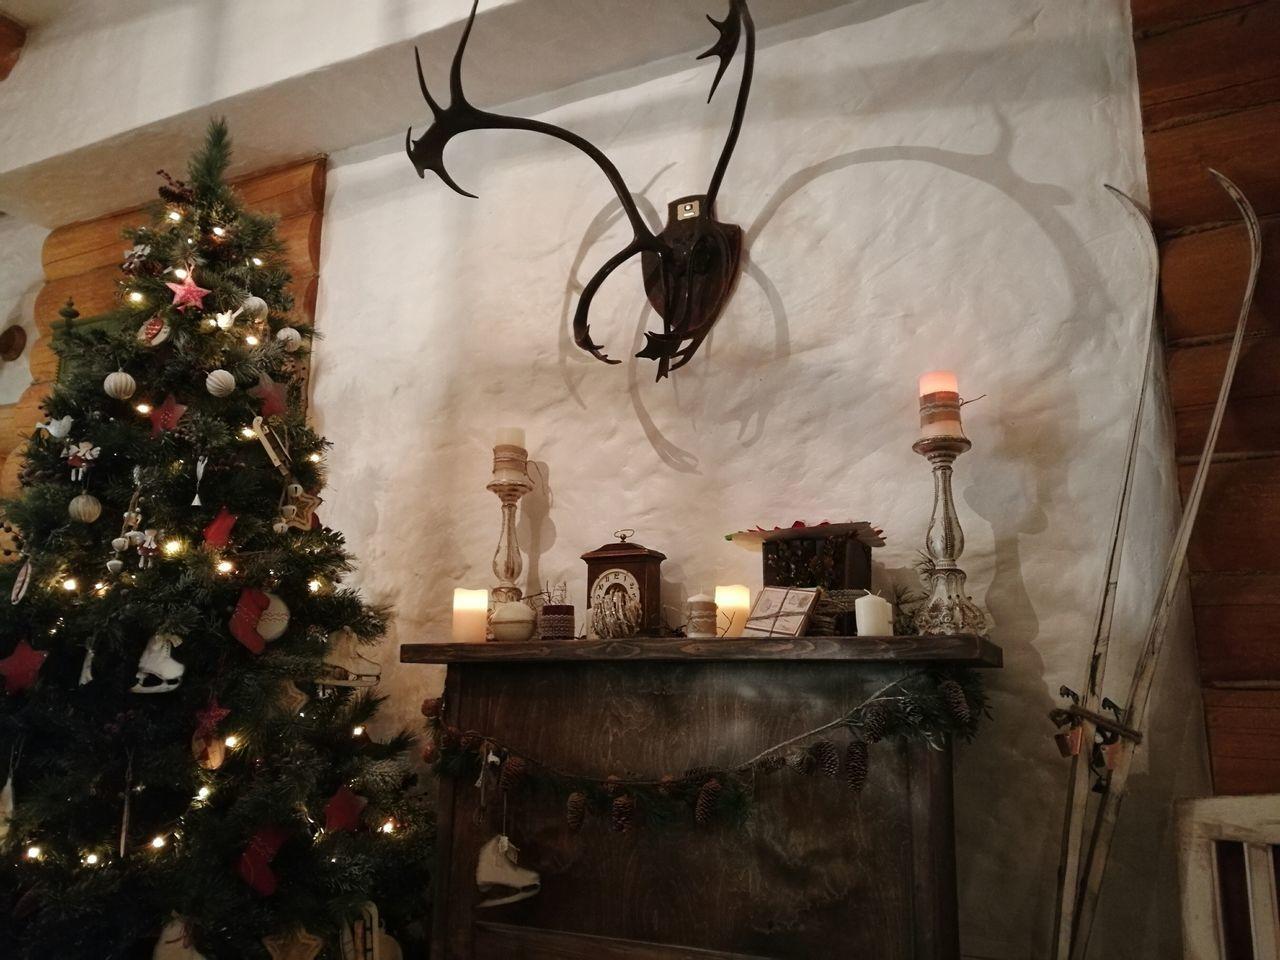 Christmas Tree Christmas Decoration No People Christmas EyeEmNewHere